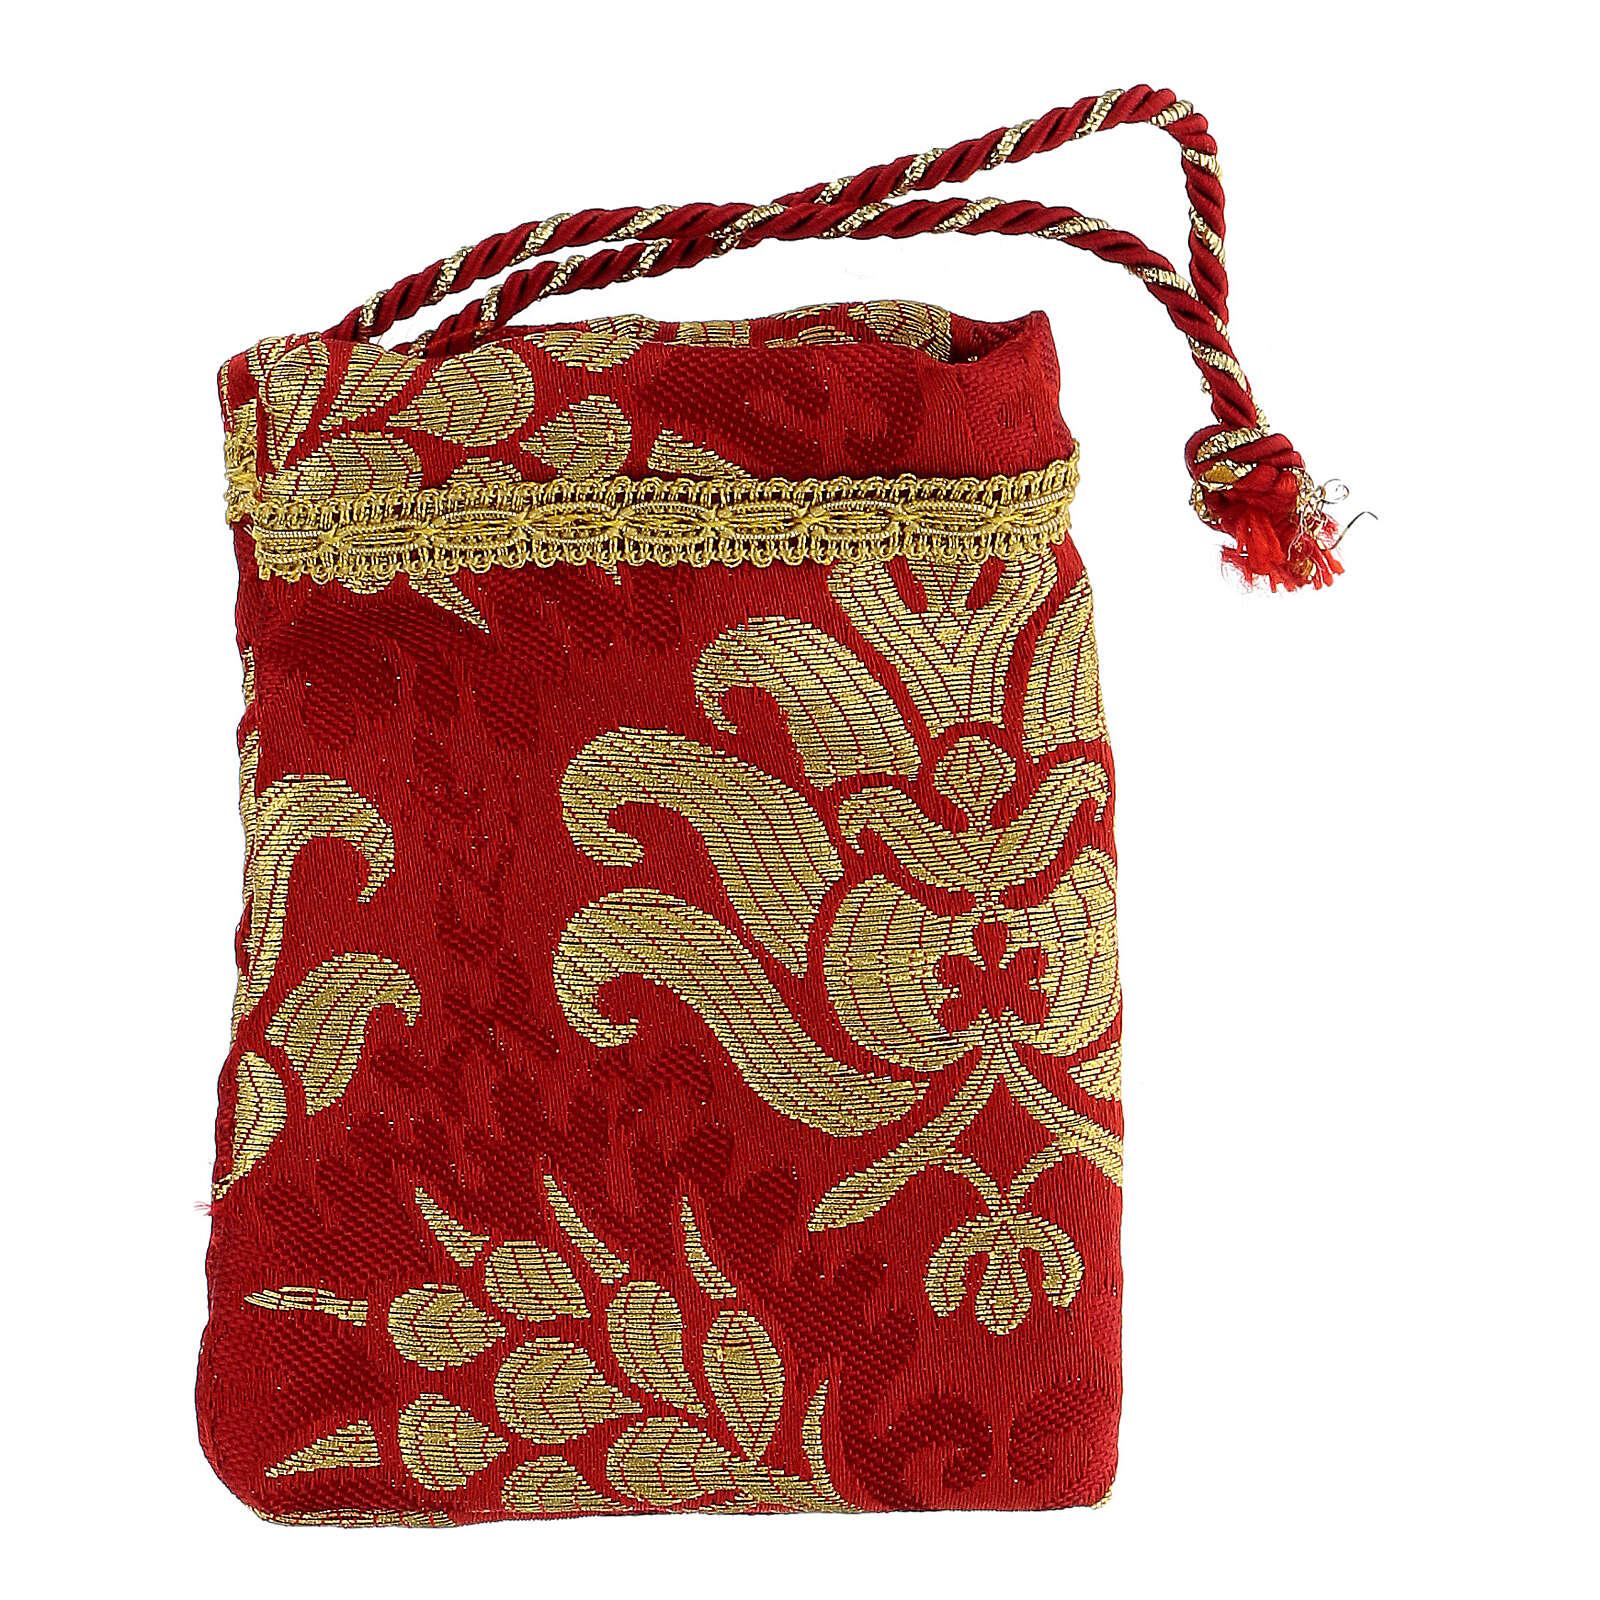 Viaticum red burse made of brocade fabric 2 in 3